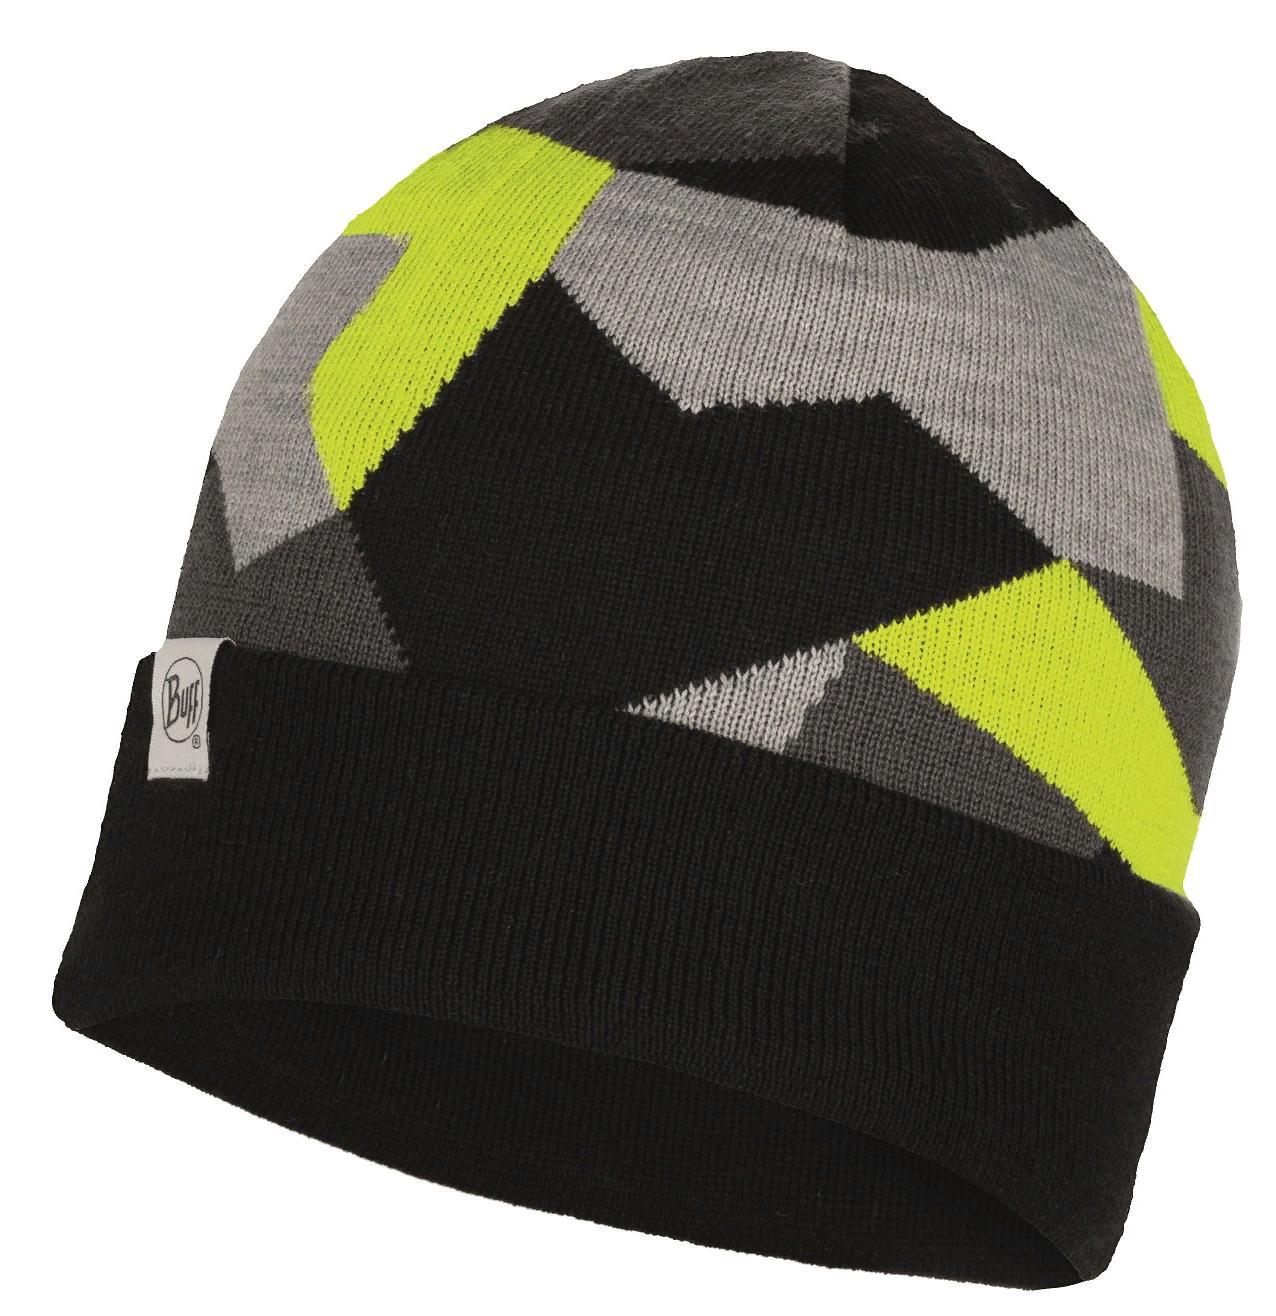 Шапка Buff Jr Knitted Hat Ran Black